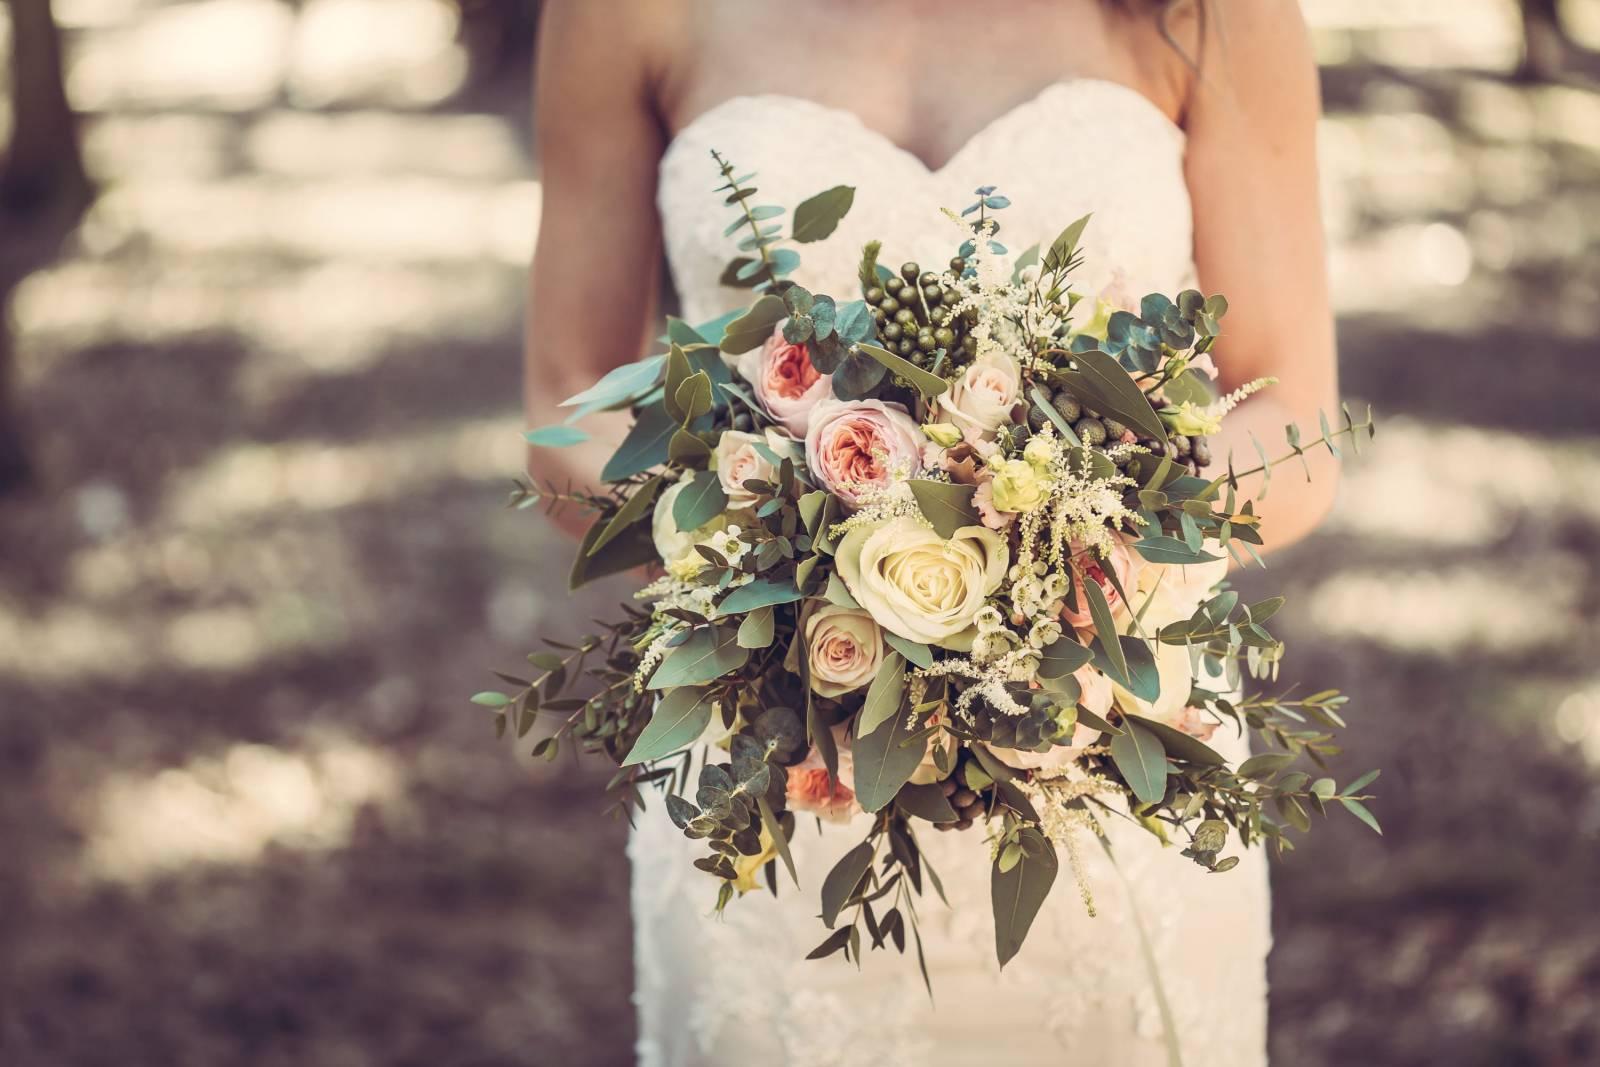 Carpe Diem Bloemen & Decoratie - House of Weddings  - 28